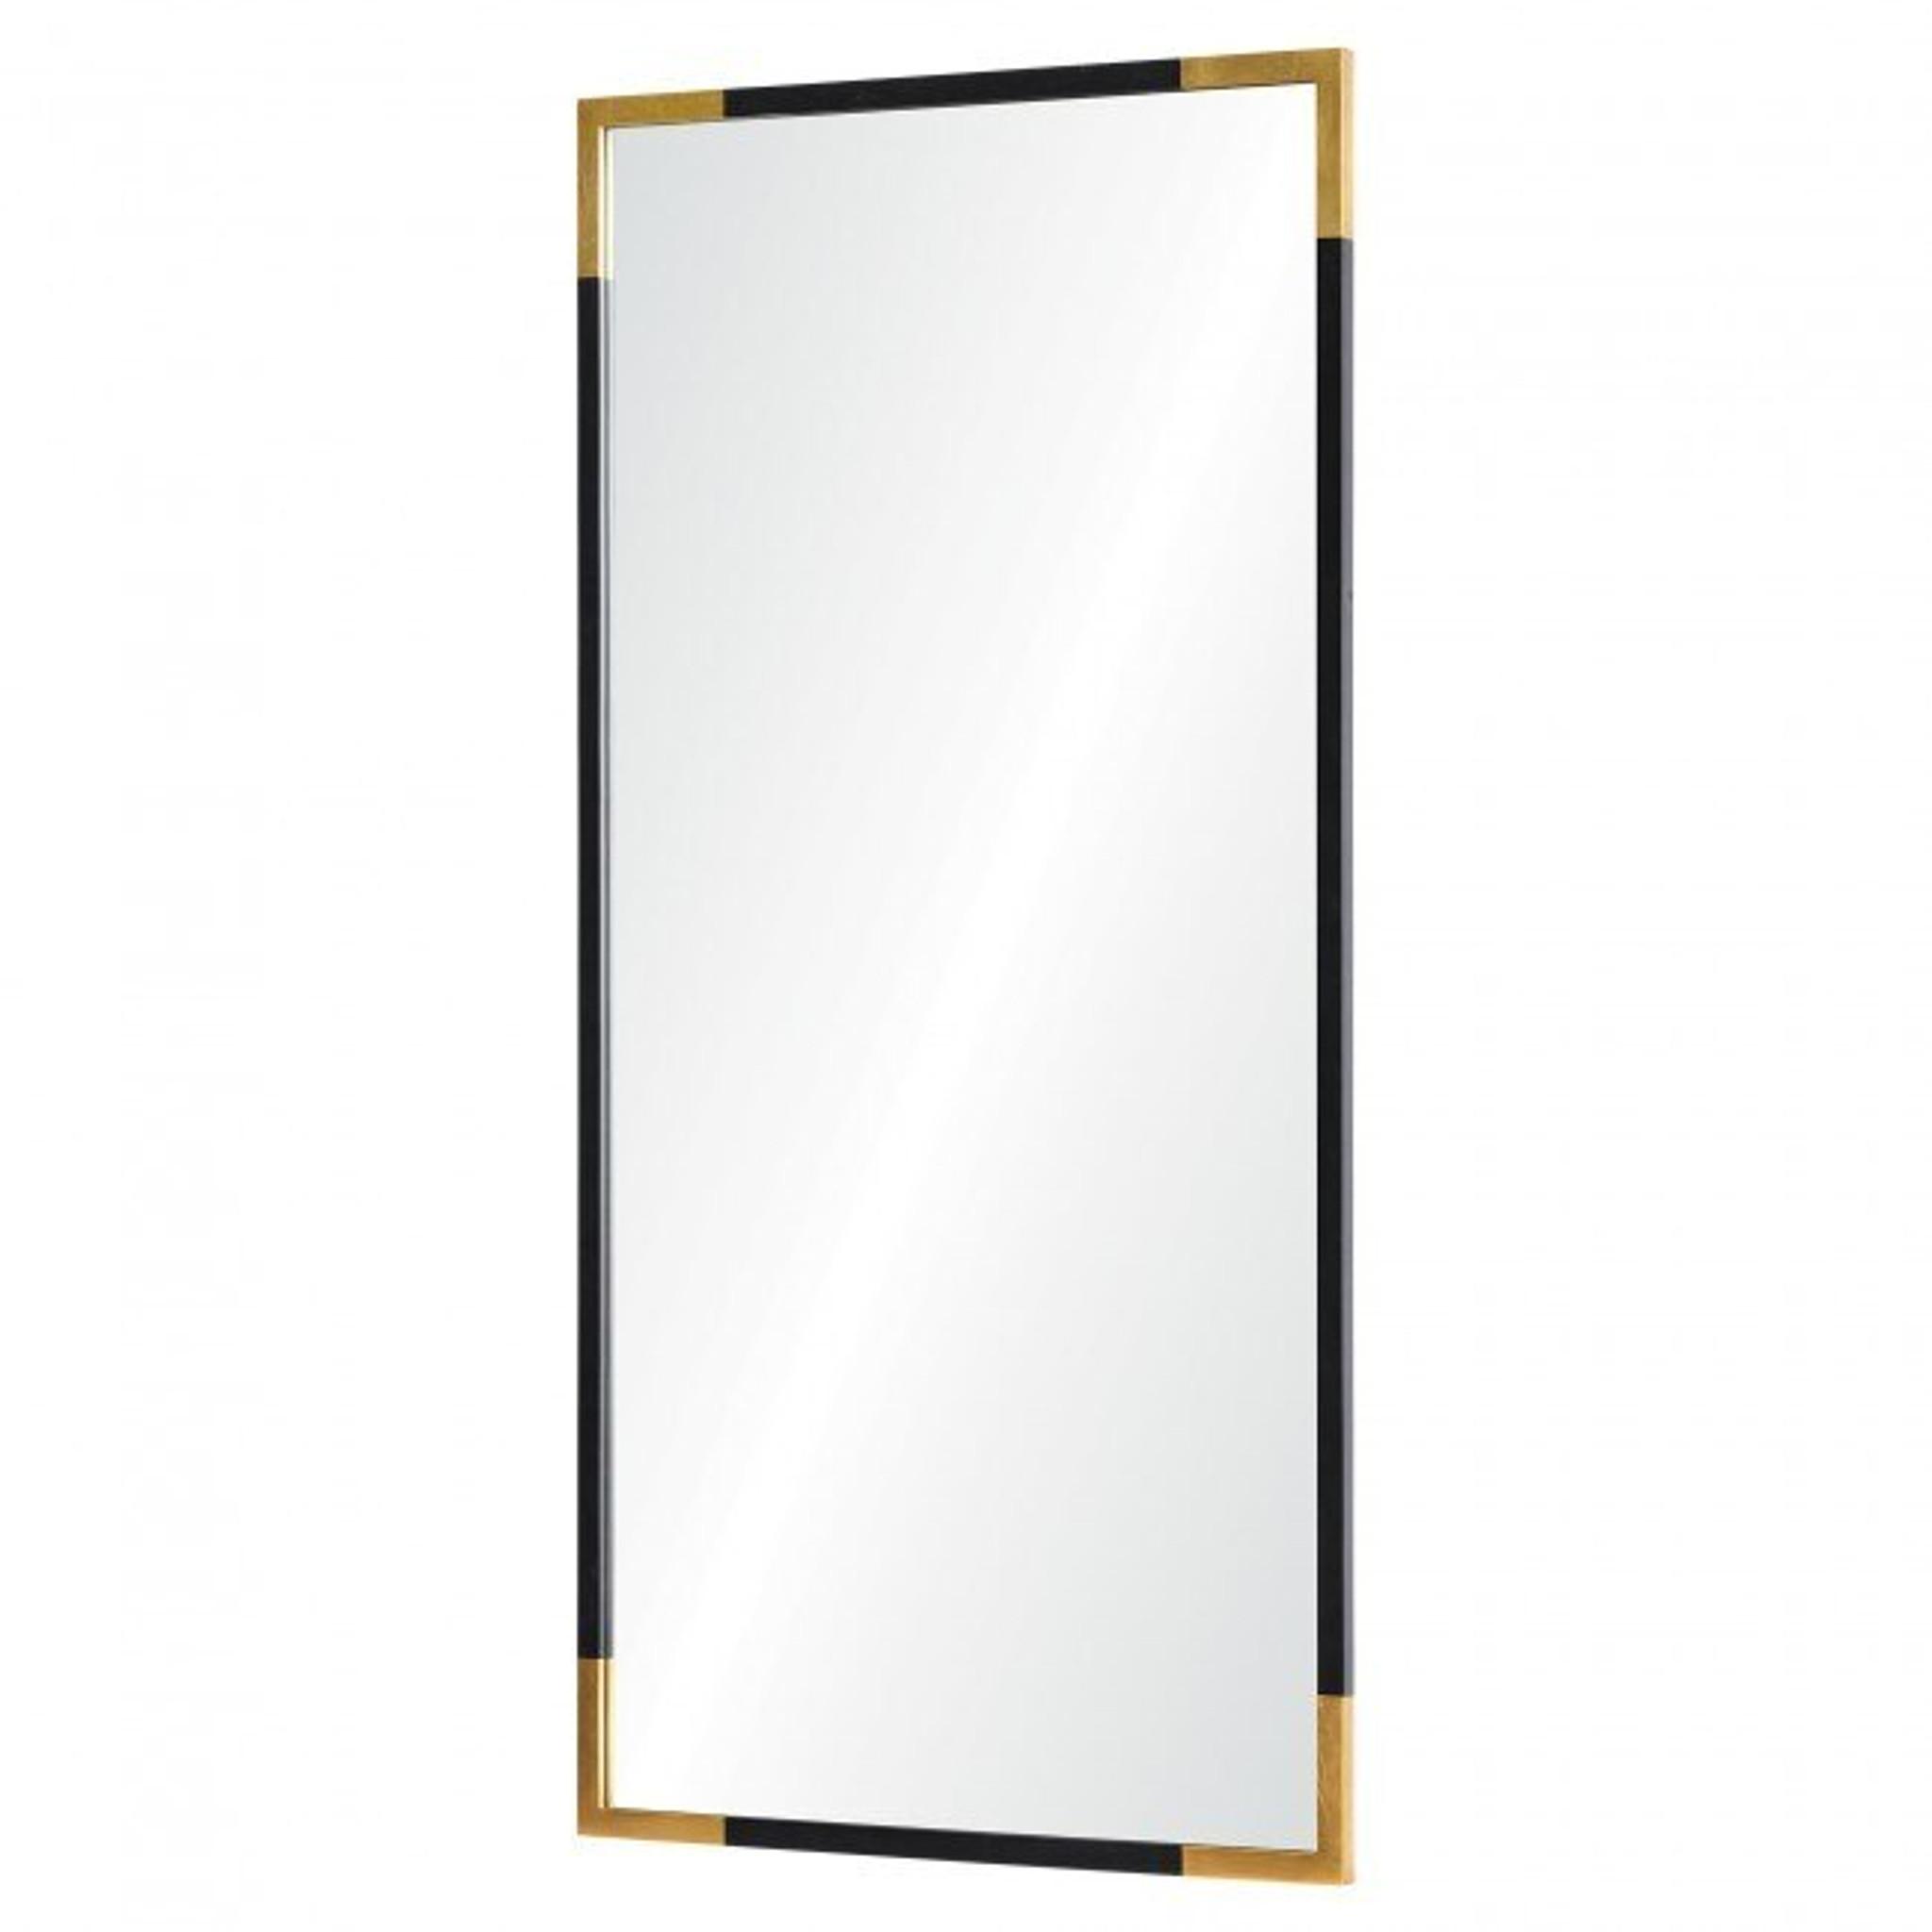 renwil Osmond black and gold cheap modern tall powder room bathroom wall decorative mirror cb2 west elm